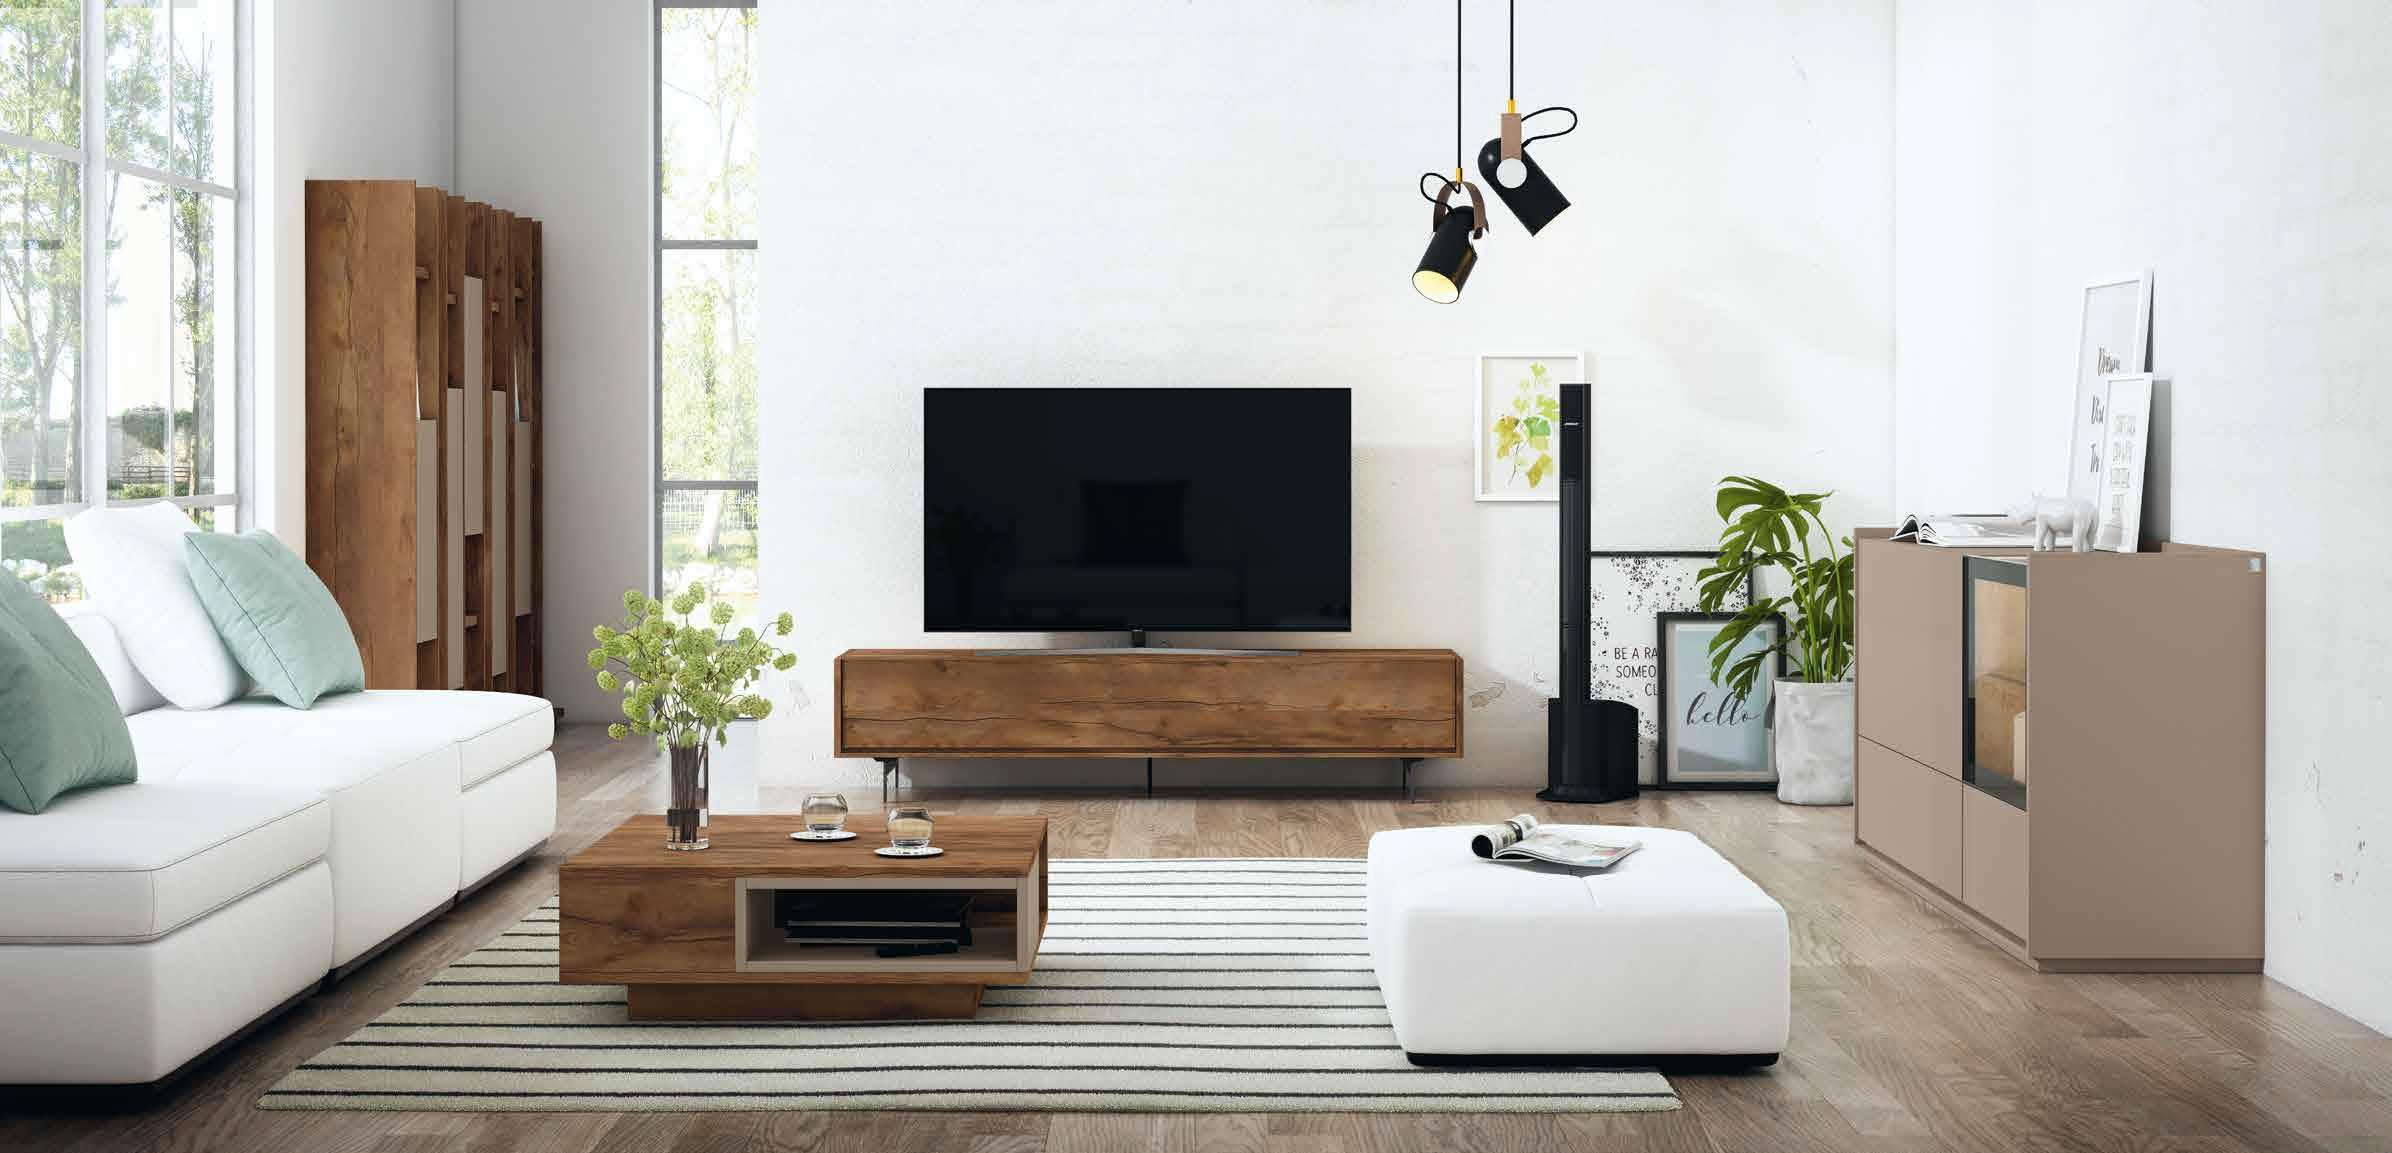 salon-moderno-Nativ-2019-muebles-paco-caballero-0920-5c8ceab92fca0